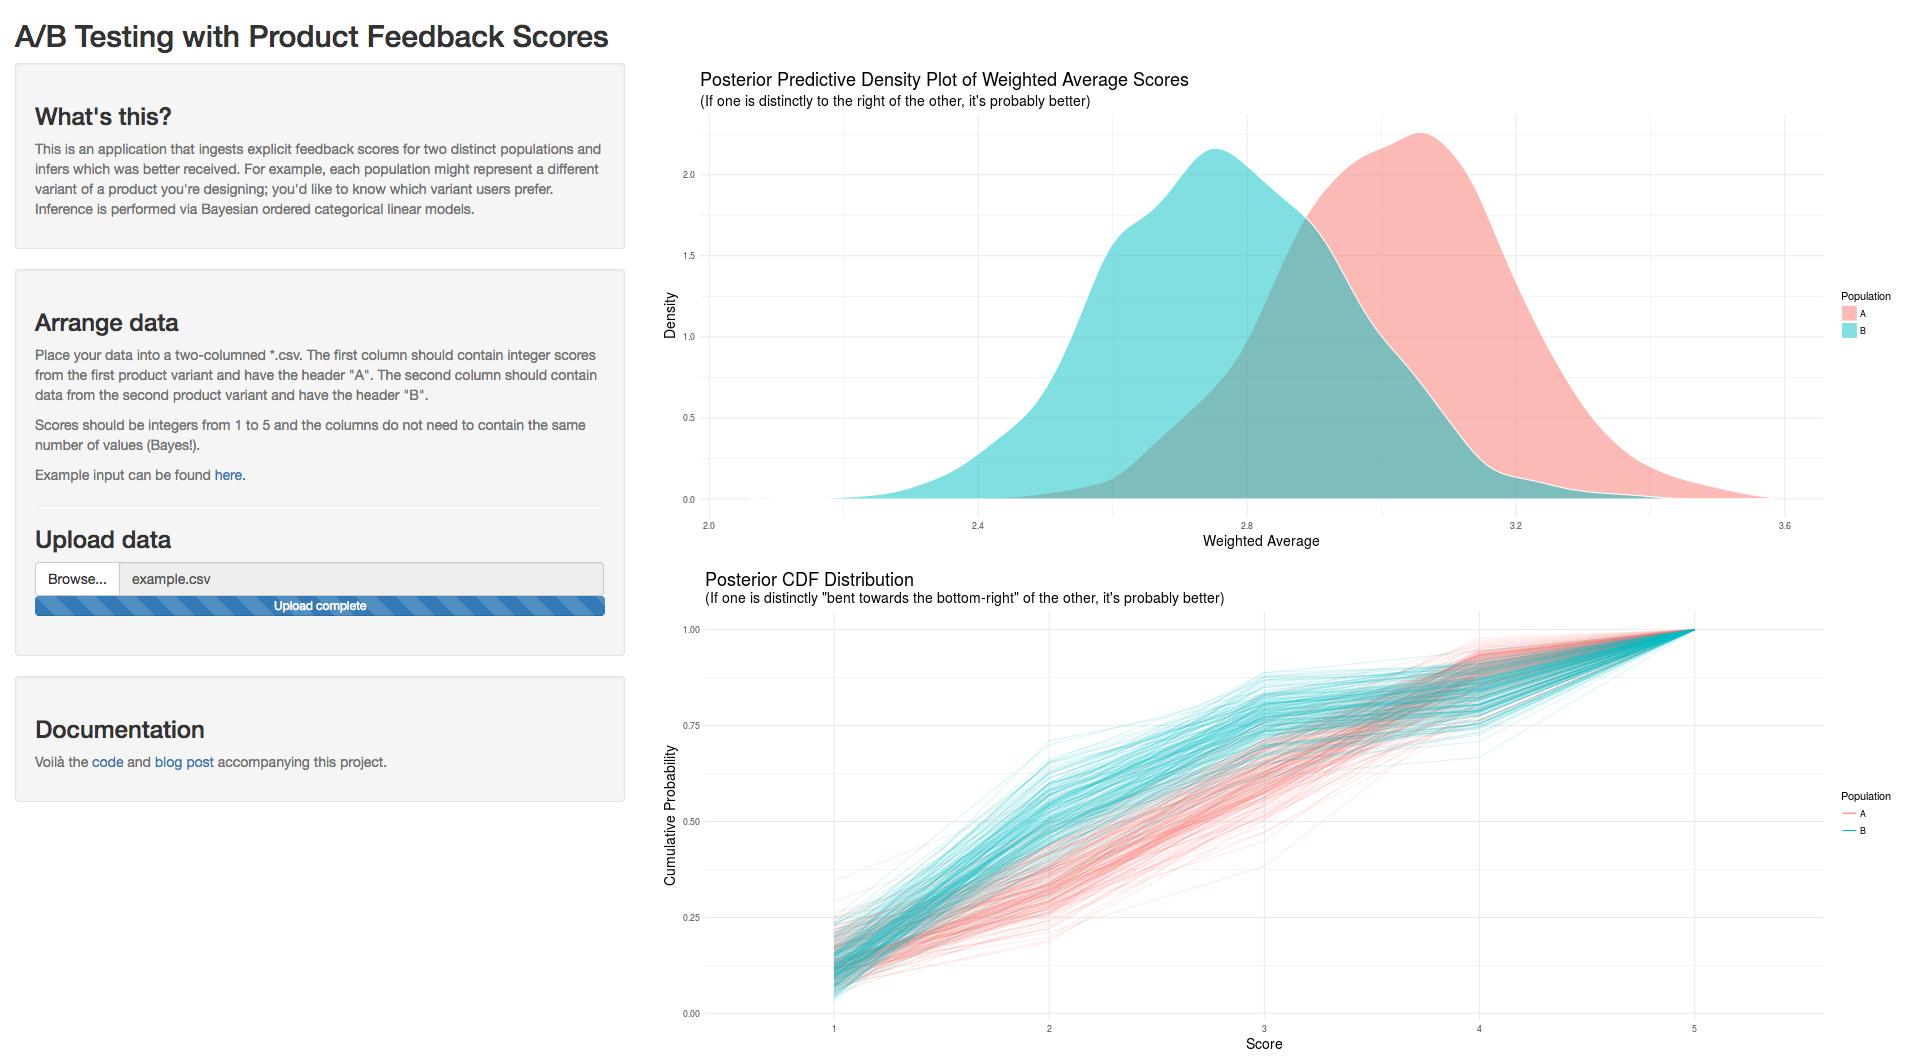 a/b comparison plot